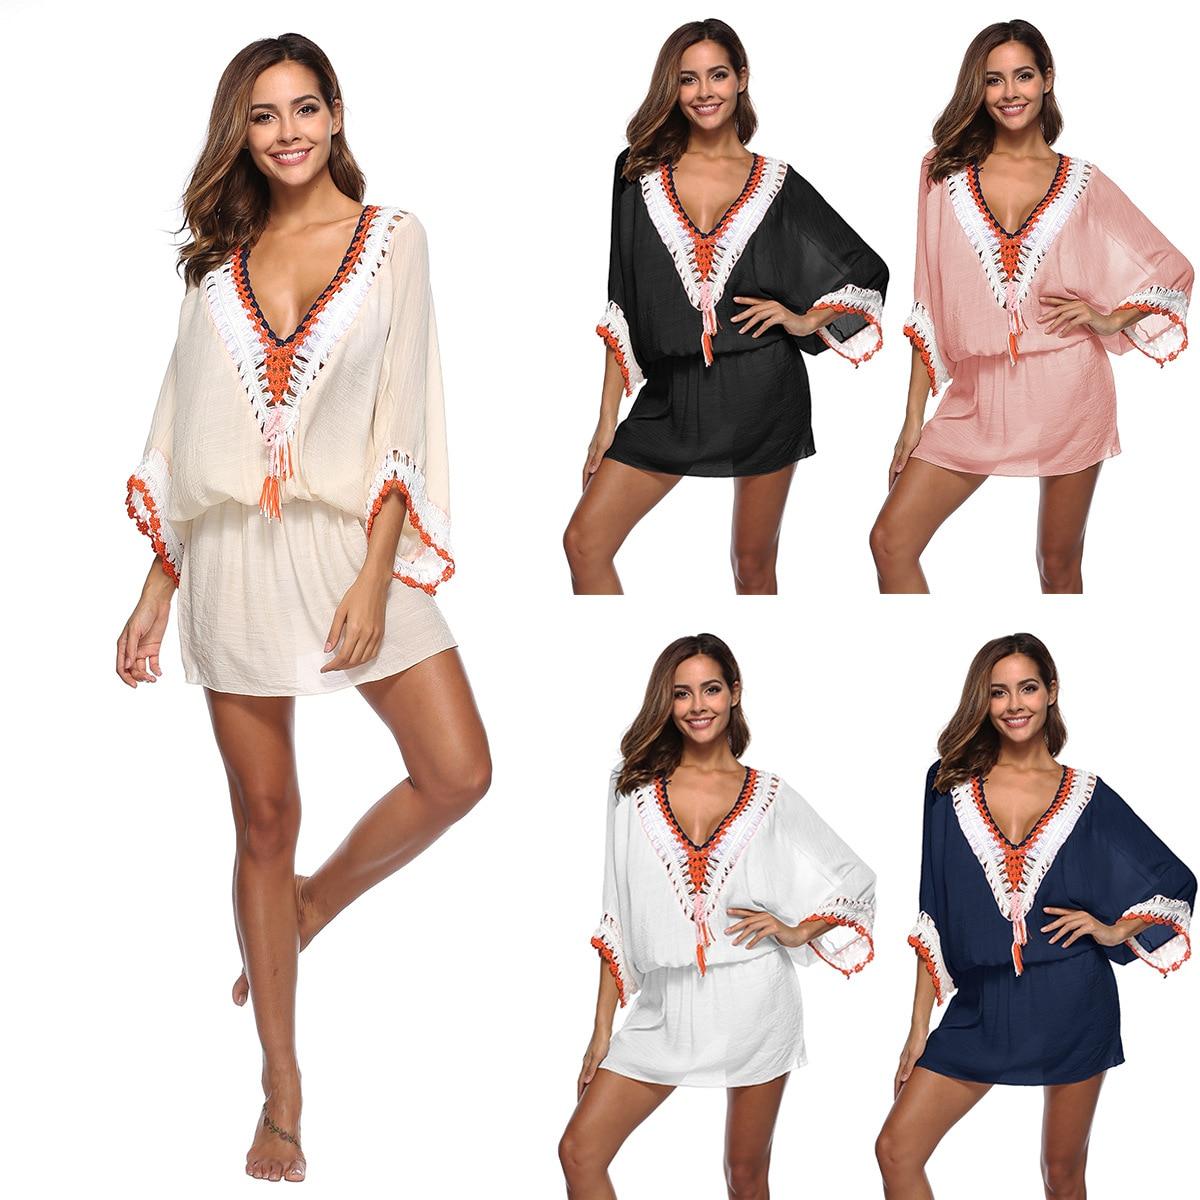 Cover Up Beach Dress Bathing Suit Women Robe De Plage Coverups For Wear Swimsuit Neck Bat Long Sleeve A1905 Patchwork Acetate